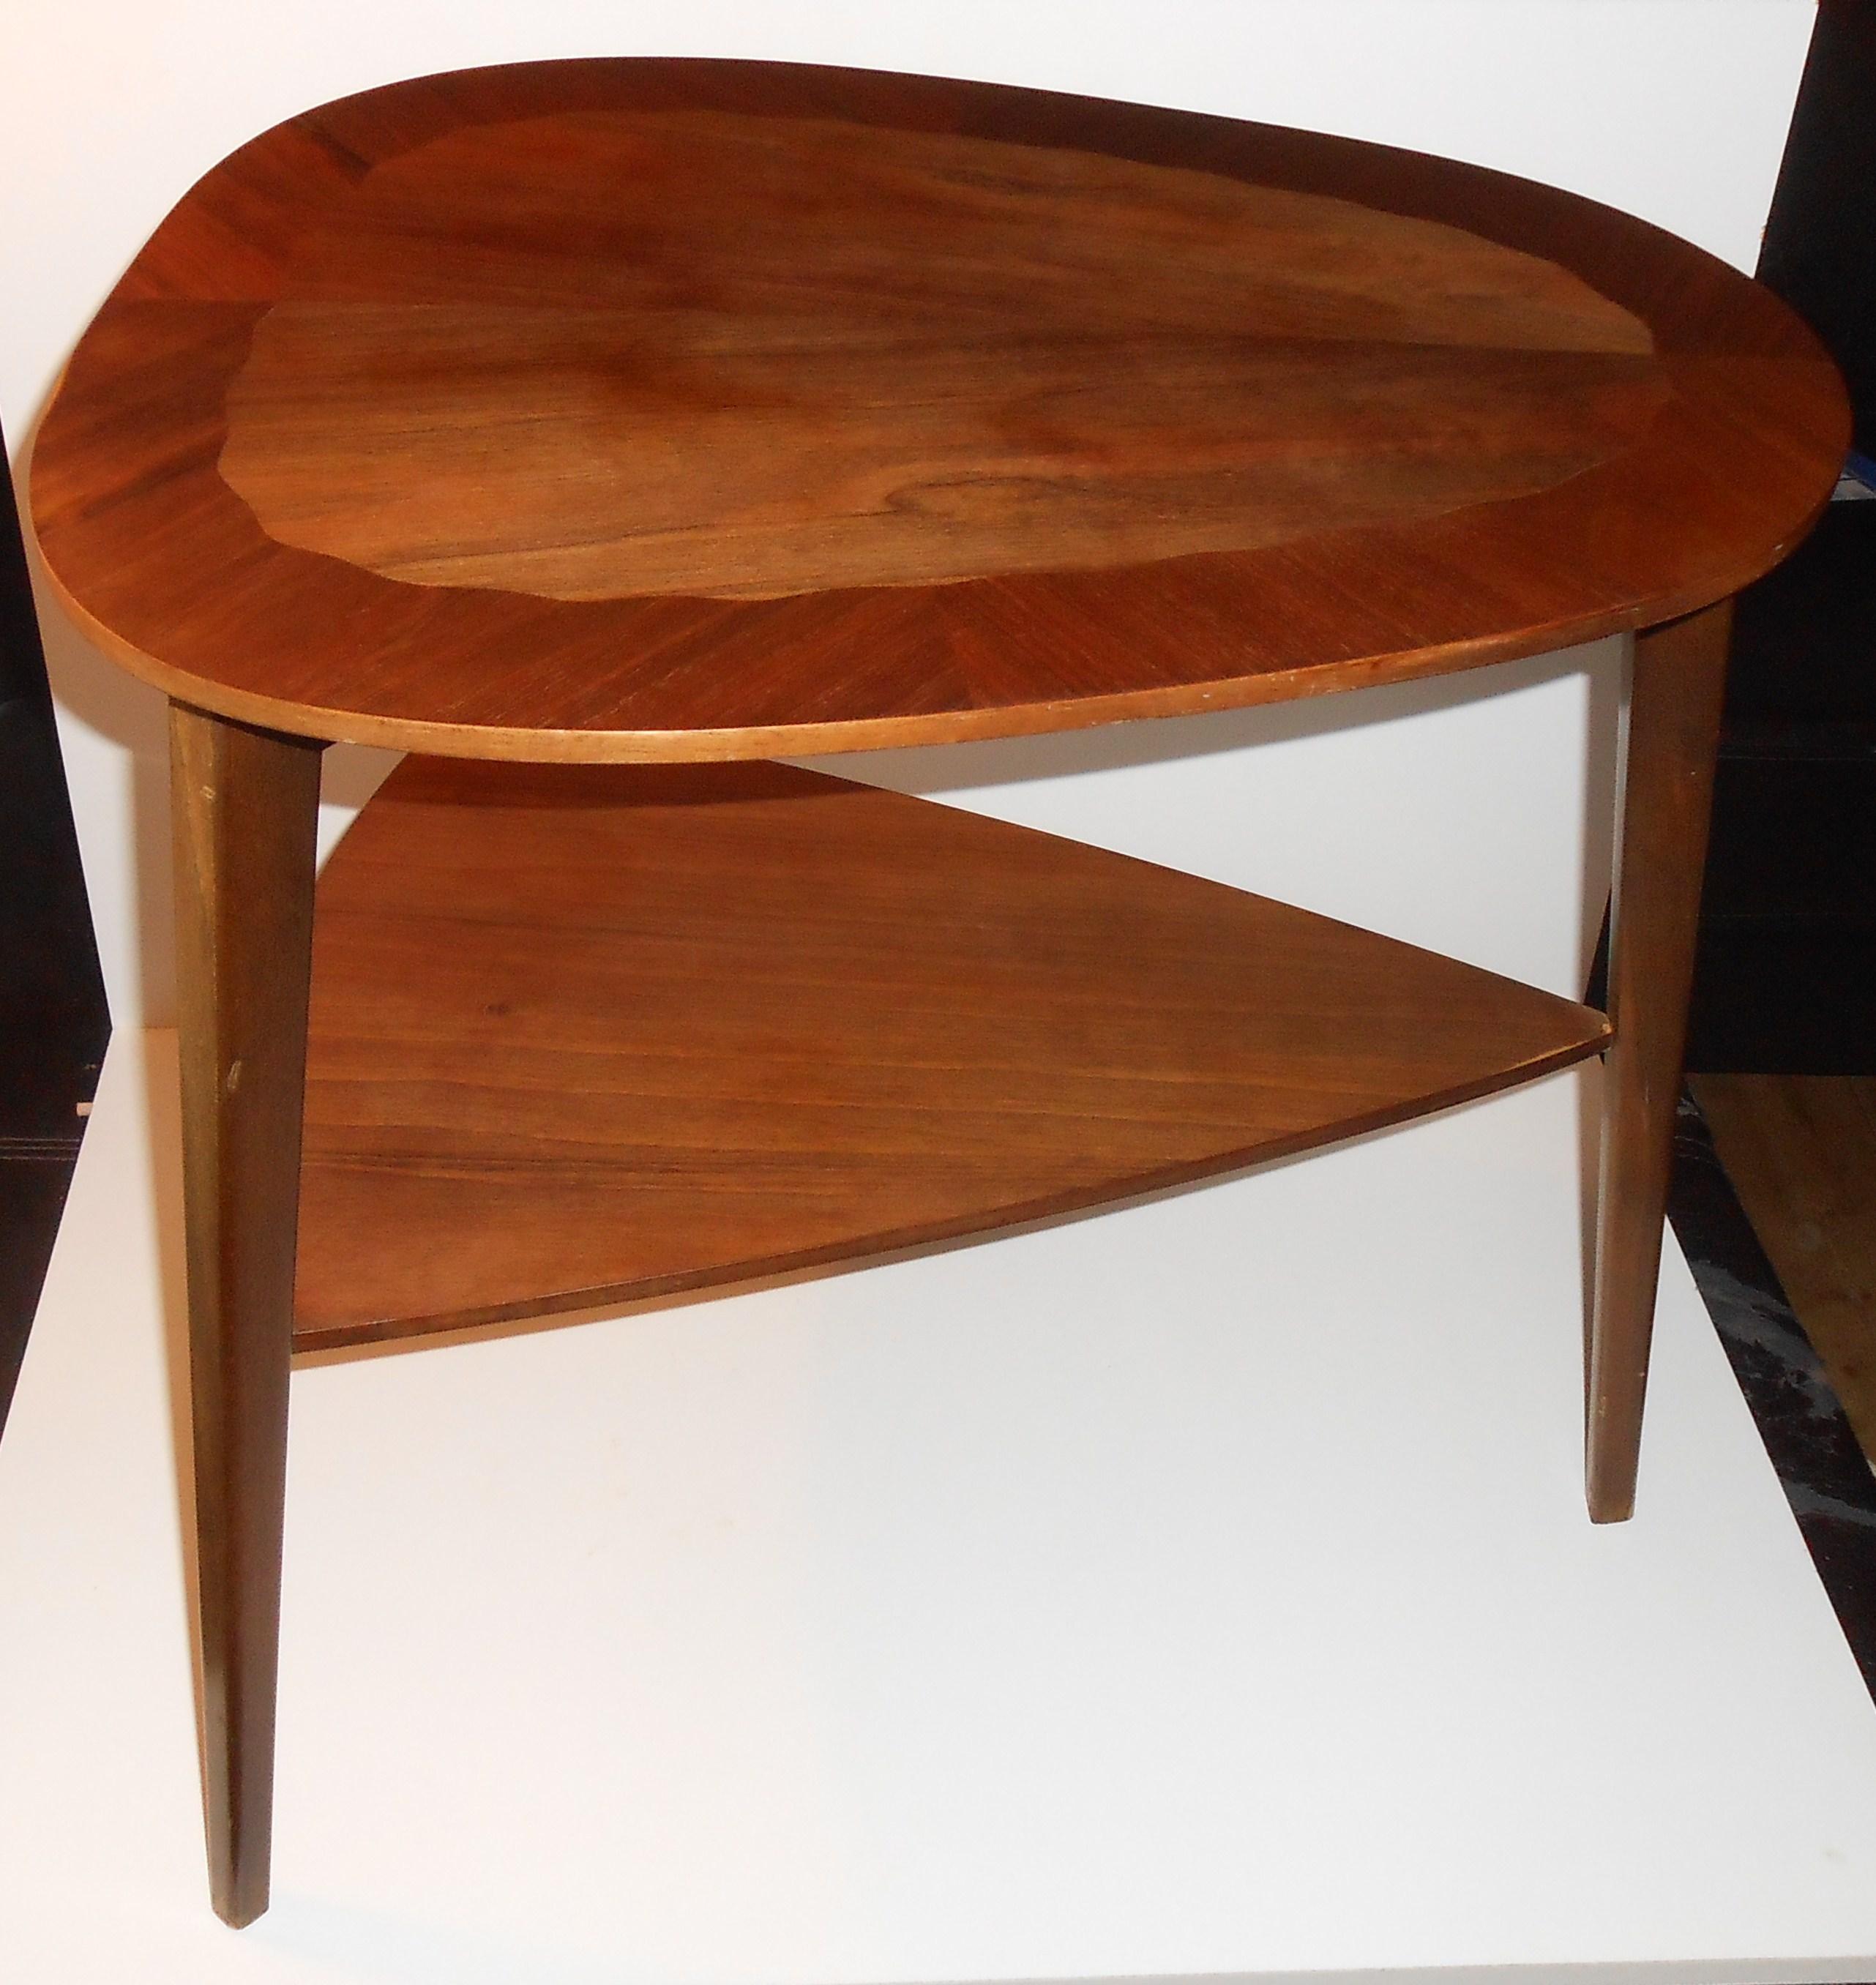 Organisk udformet sofabord i teak dansk design u2013 retro design dk